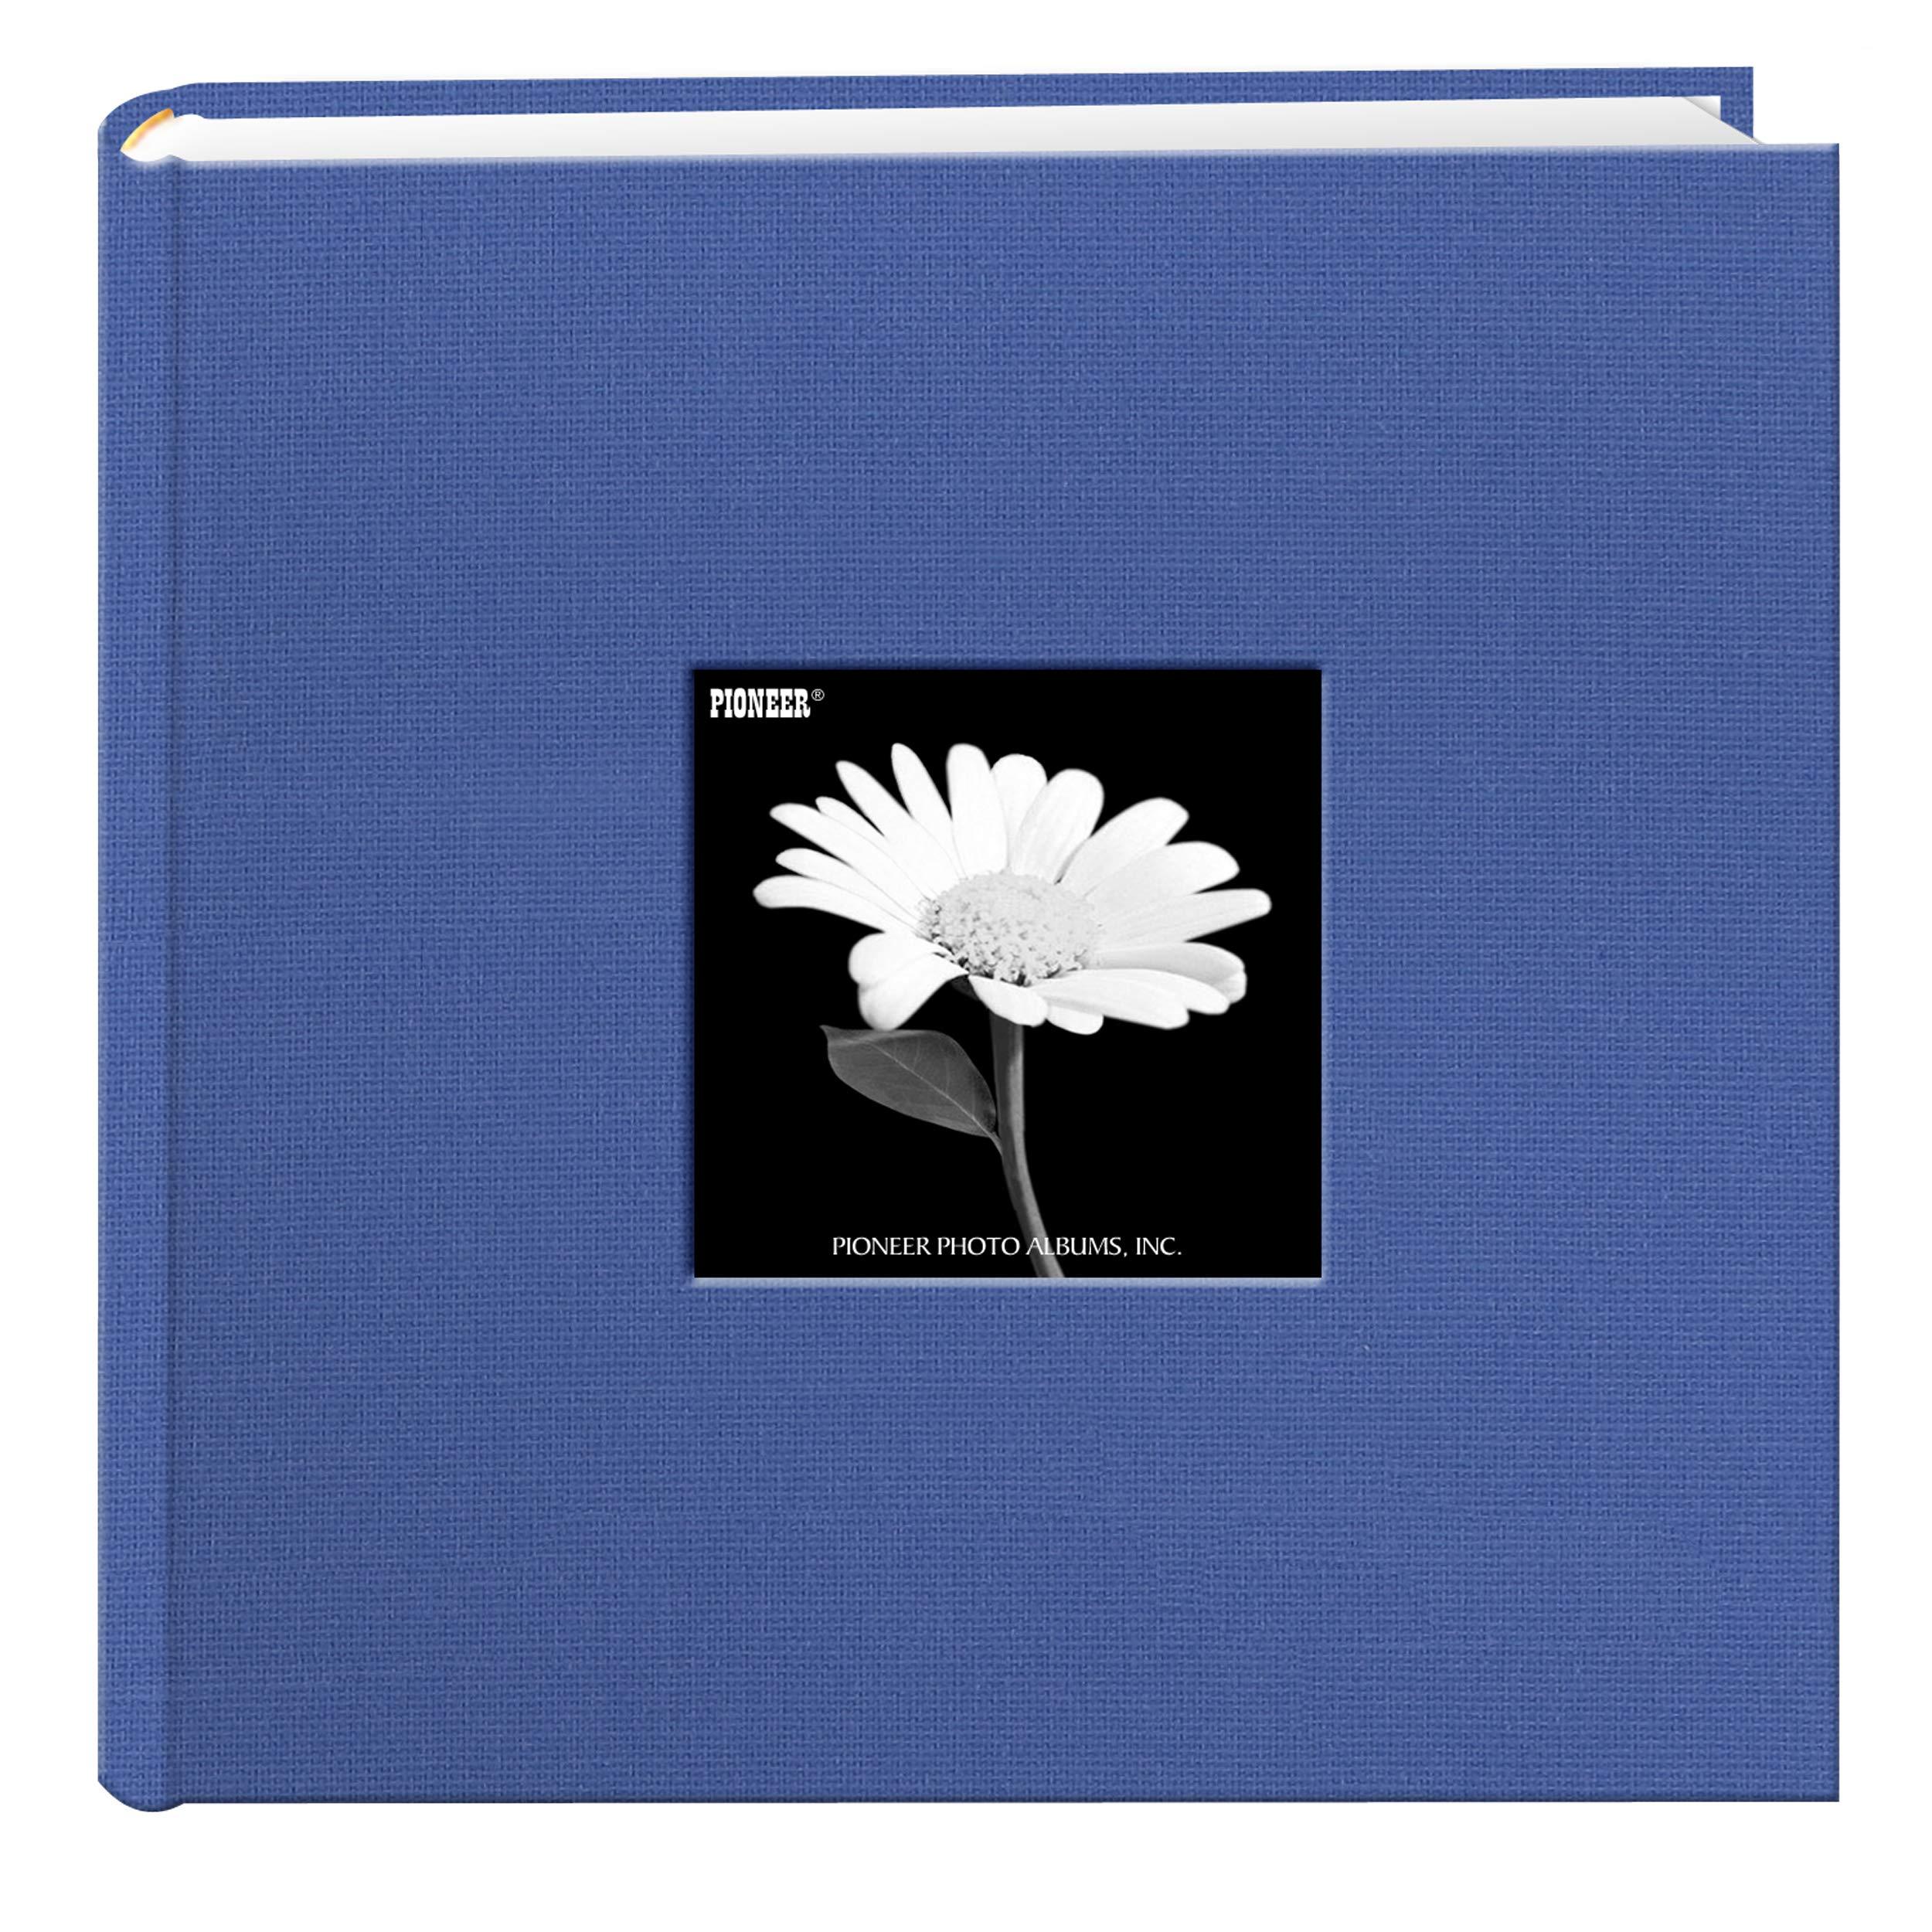 Fabric Frame Cover Photo Album 200 Pockets Hold 4x6 Photos, Sky Blue by Pioneer Photo Albums